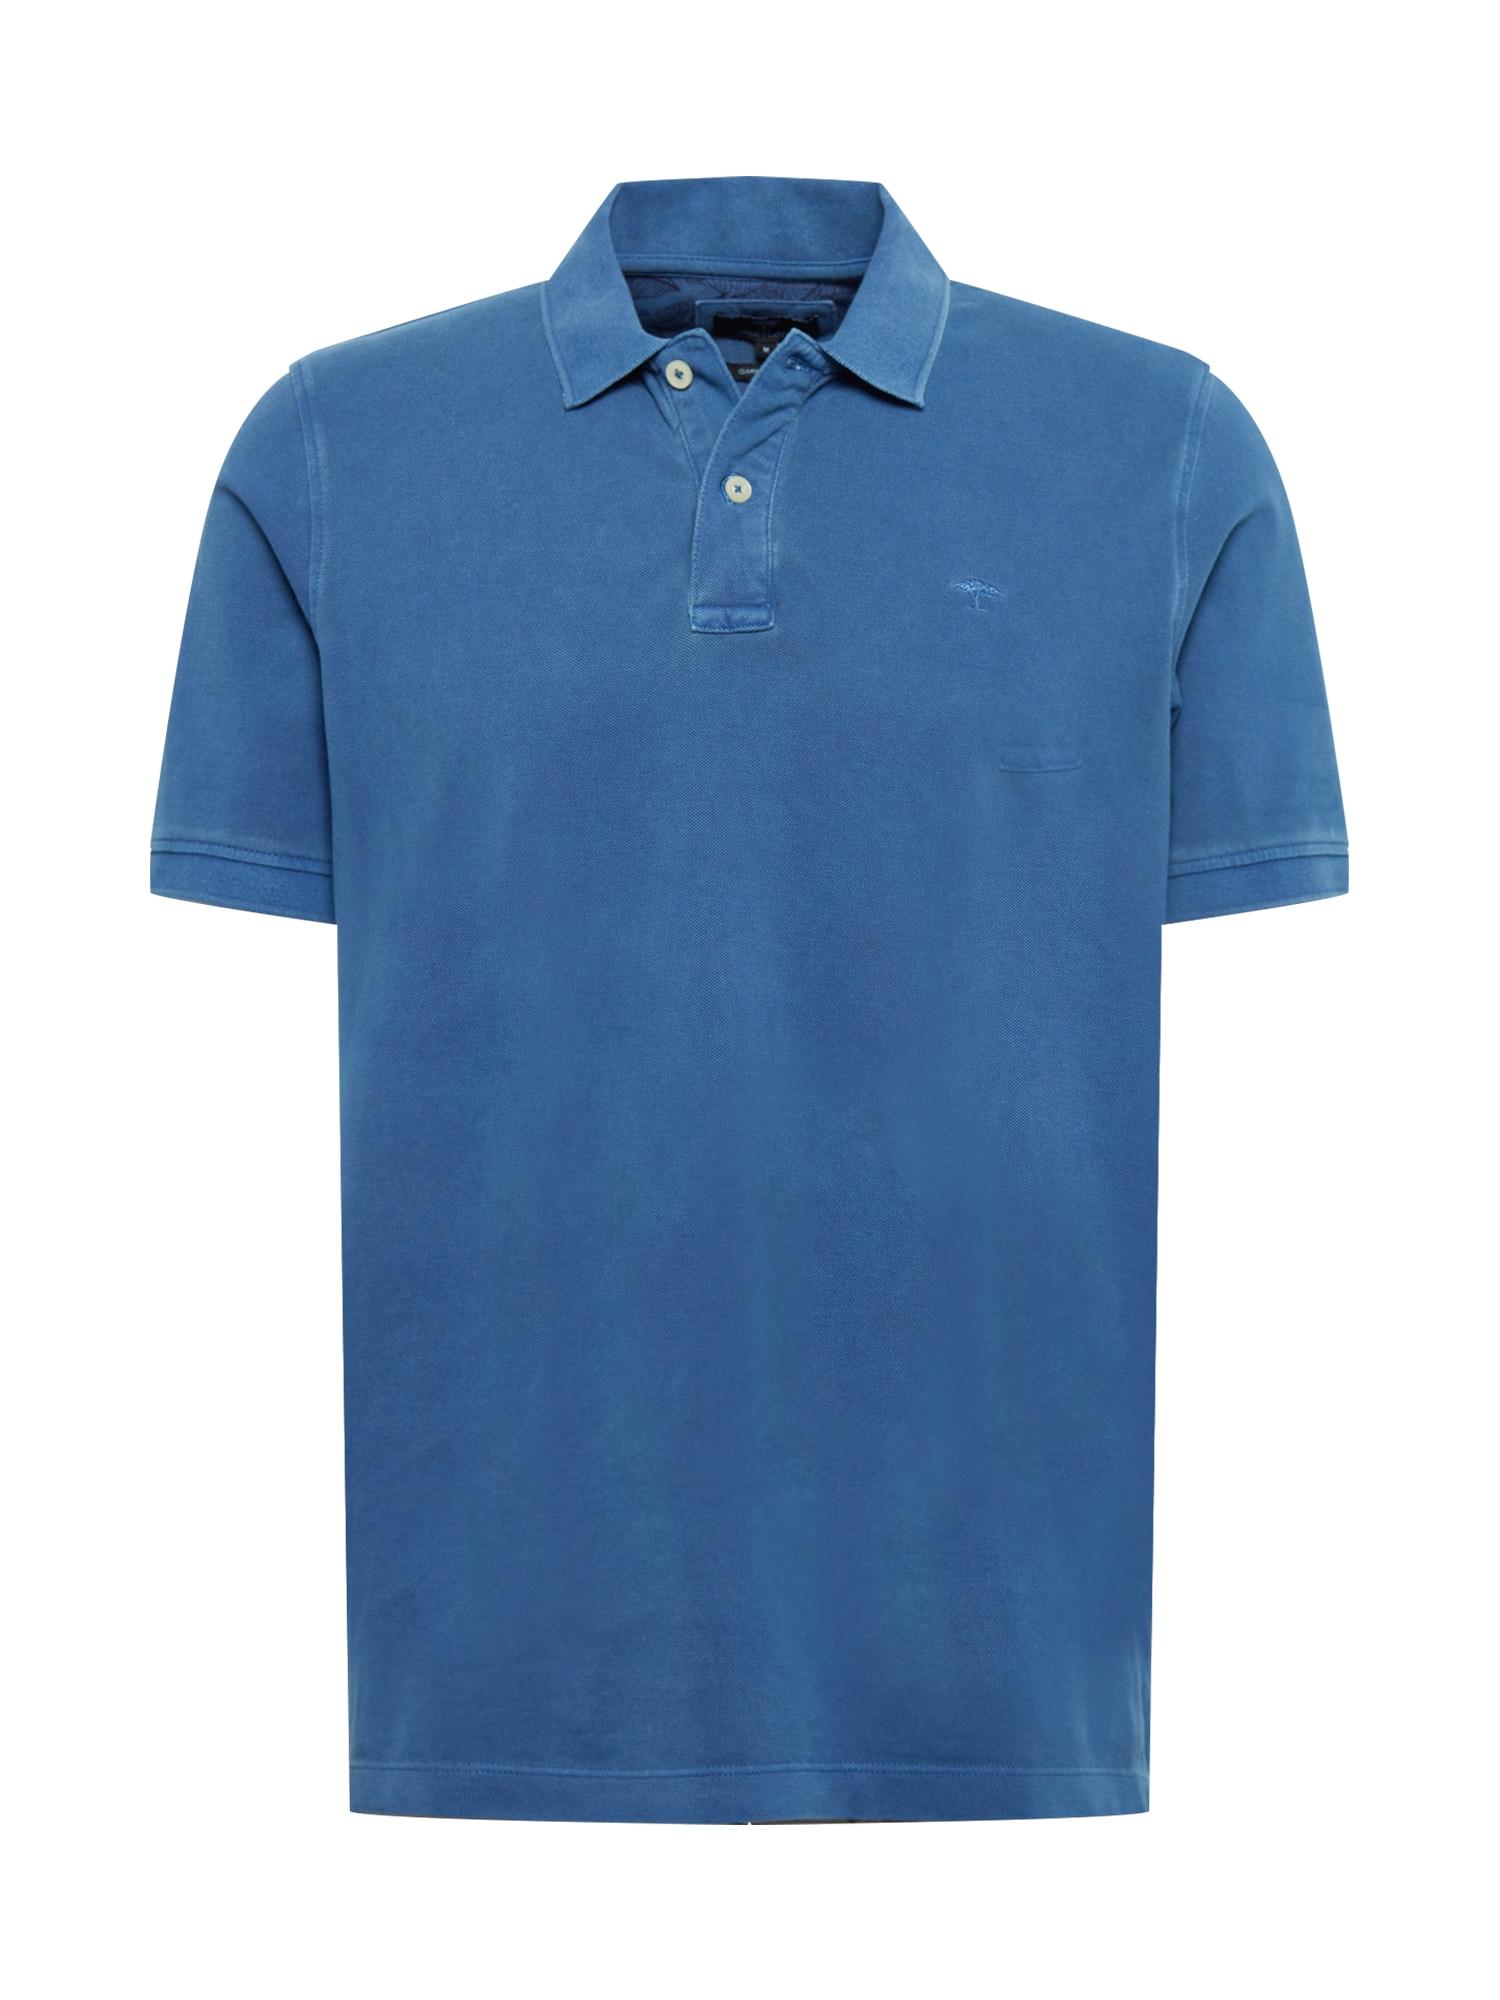 FYNCH-HATTON Marškinėliai tamsiai mėlyna